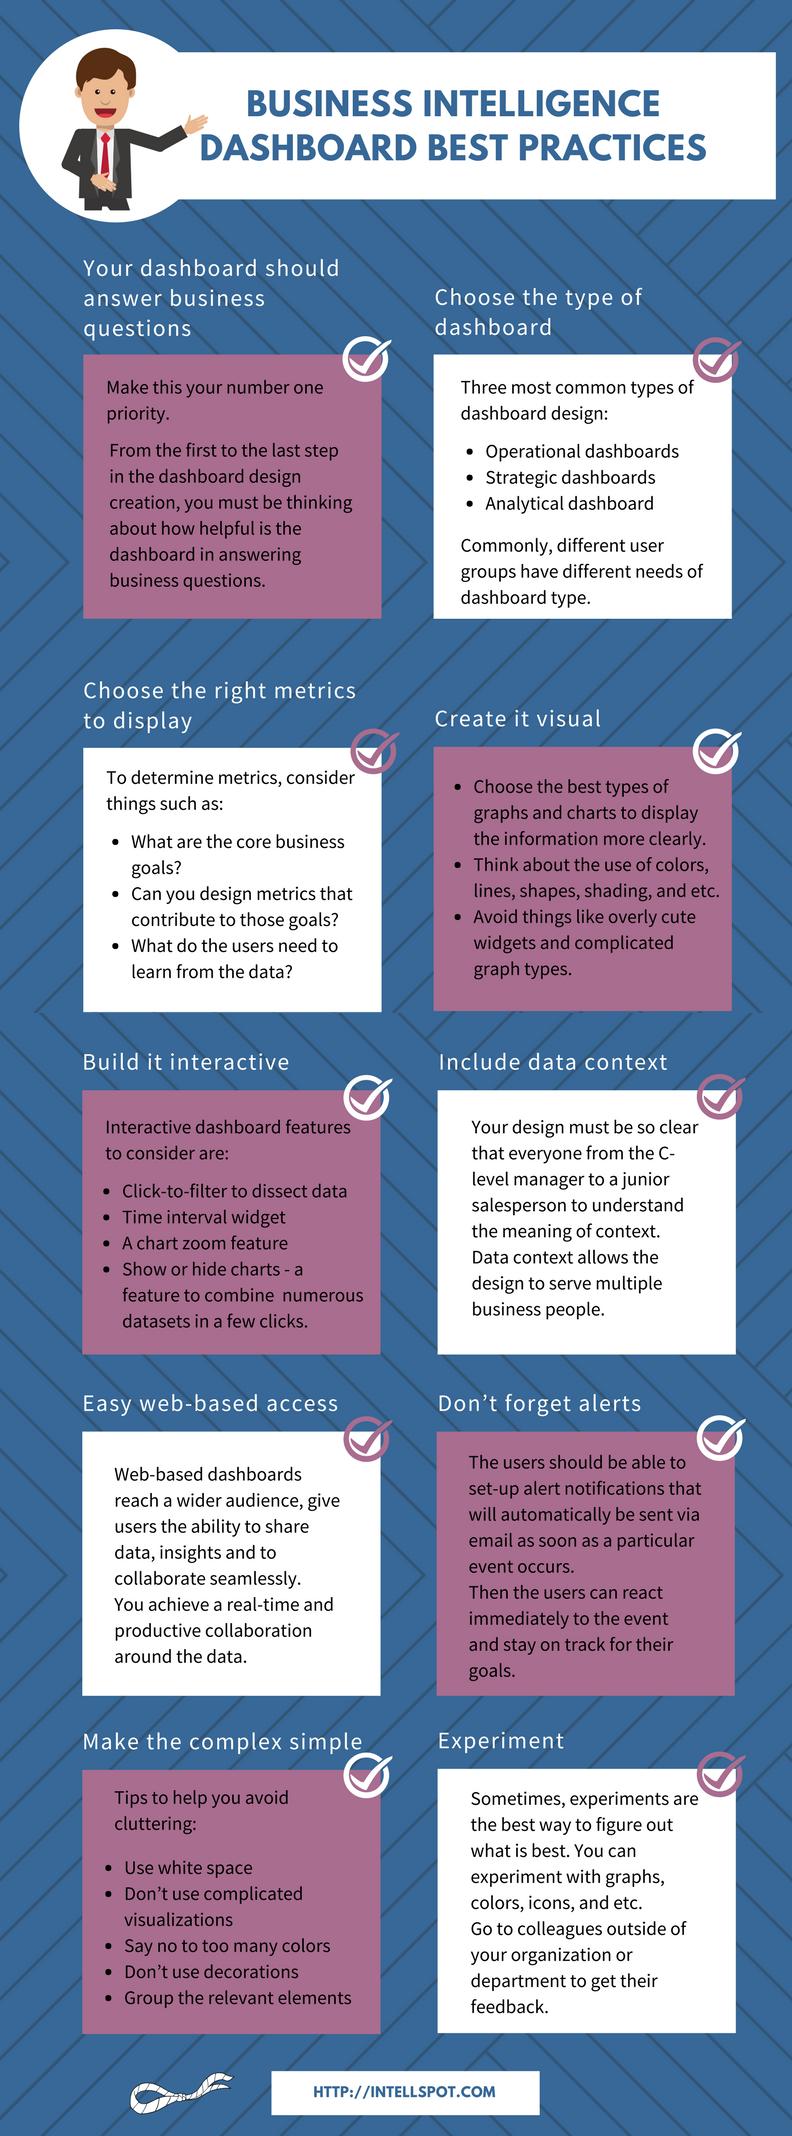 BI Dashboard Best Practices - Infographic